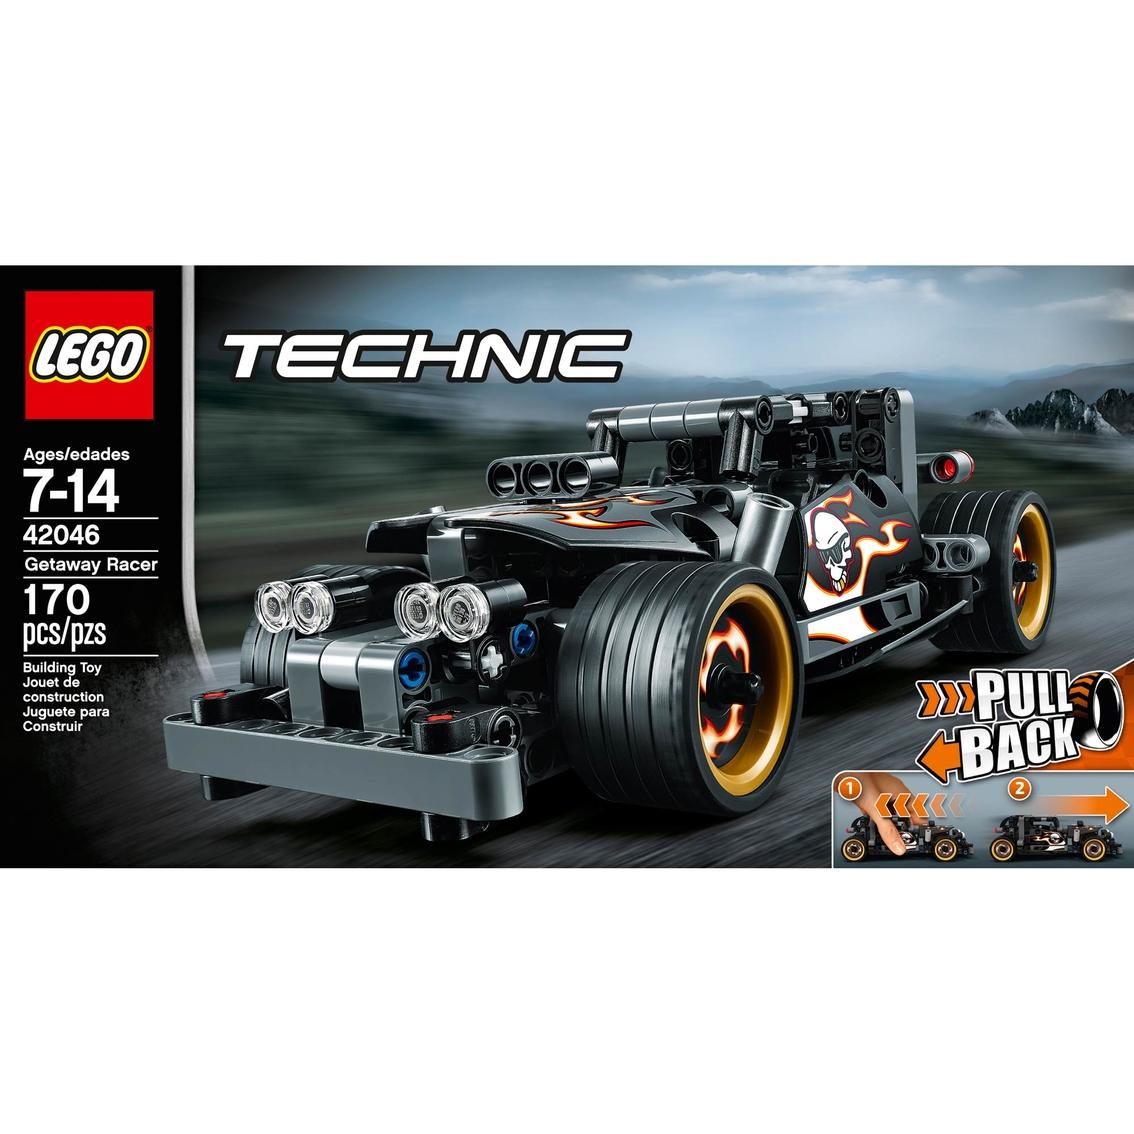 Lego Technic Getaway Racer Lego Technic Baby Toys Shop The